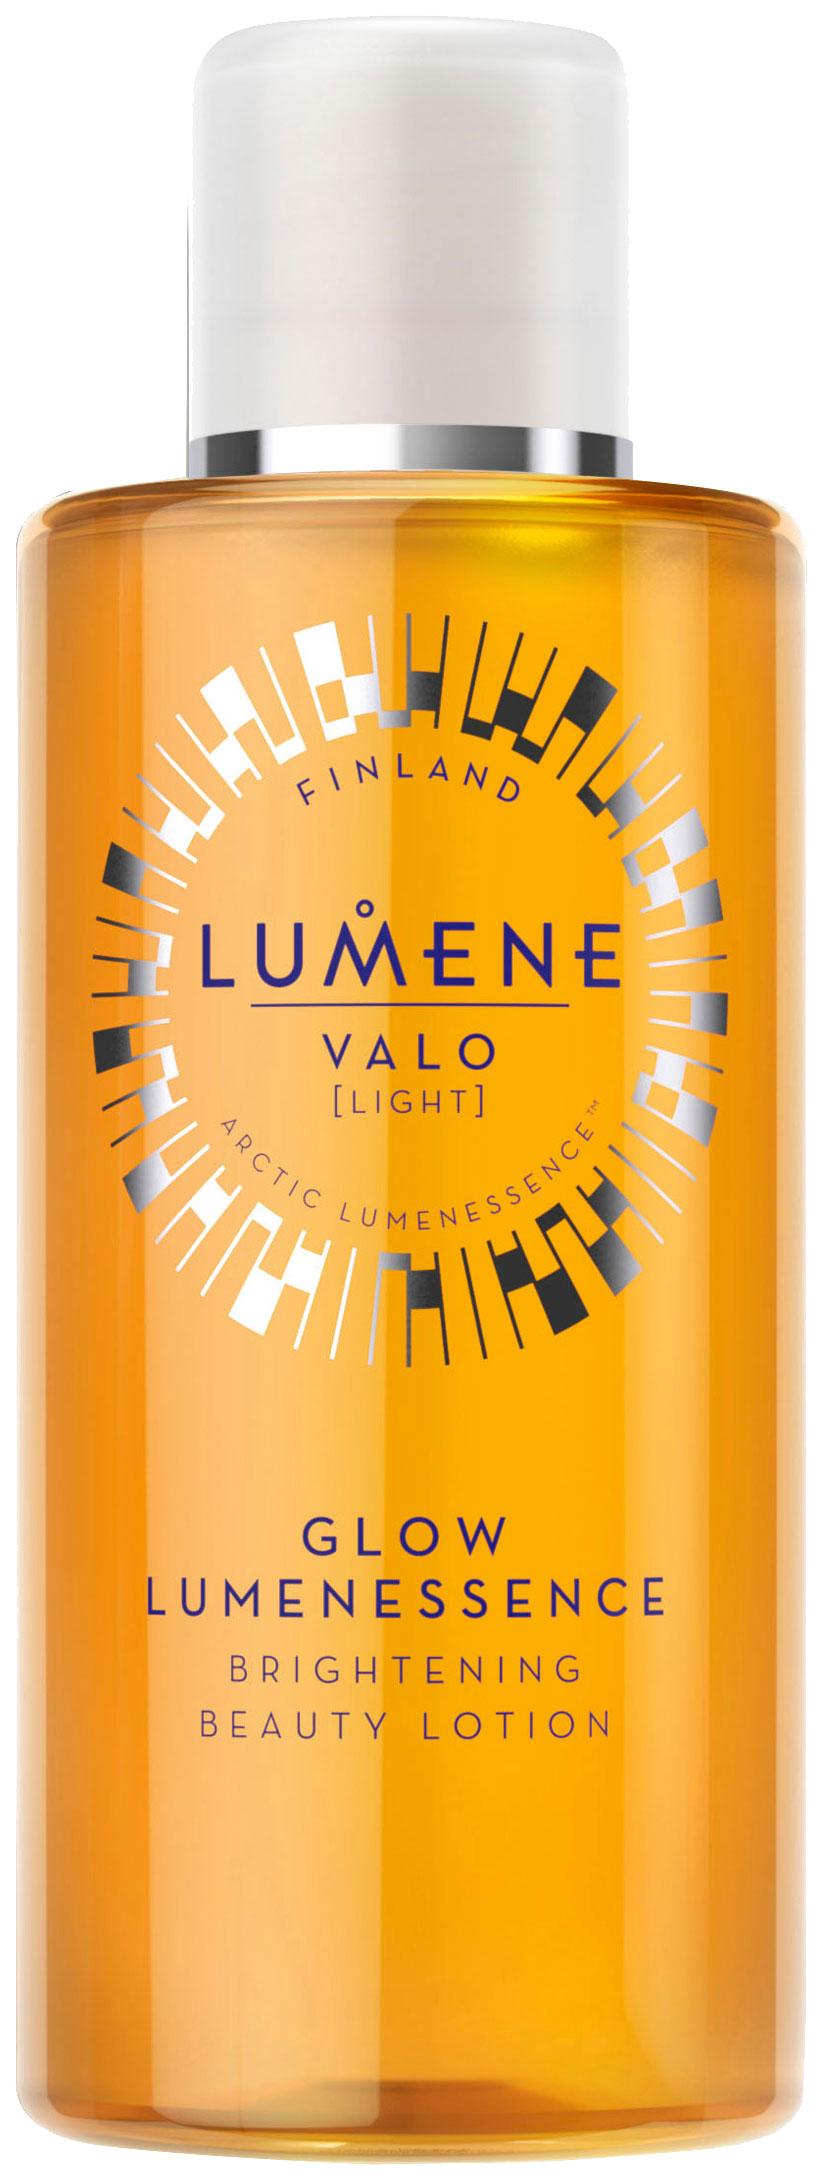 Лосьон для лица Lumene Valo Glow Lumenessence Lotion